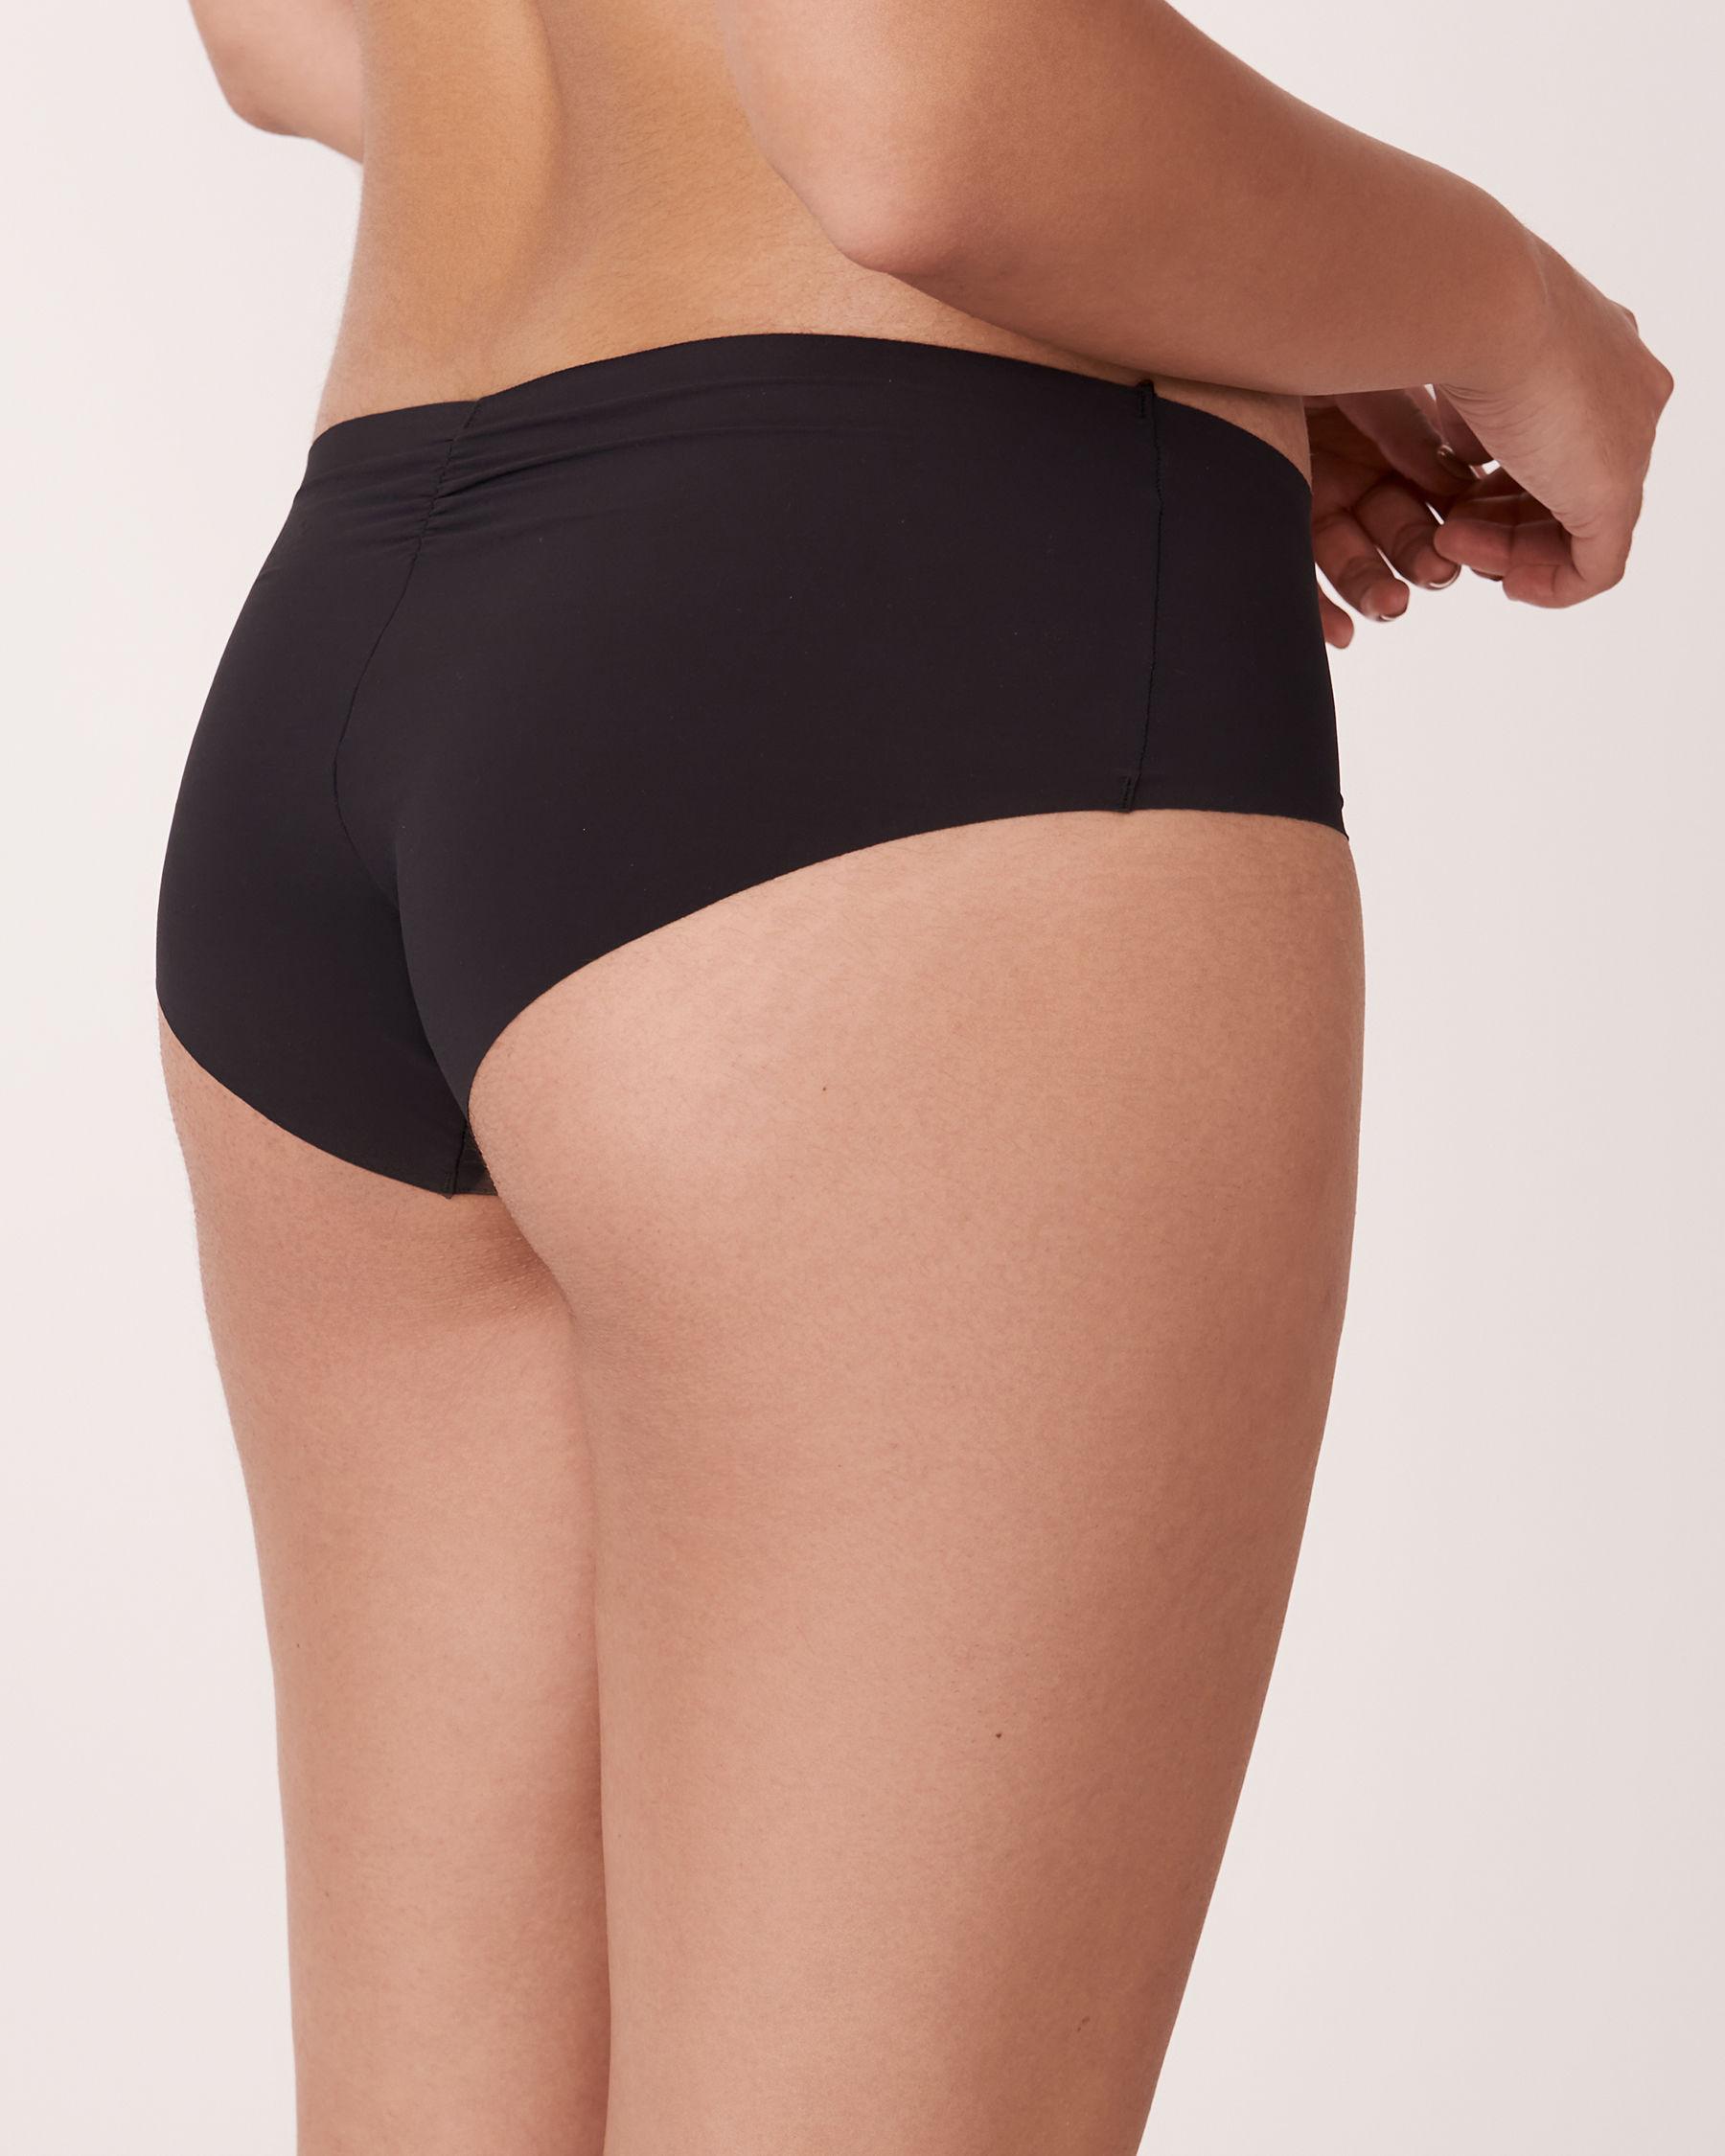 LA VIE EN ROSE Hiphugger Panty Black 619-223-1-00 - View2